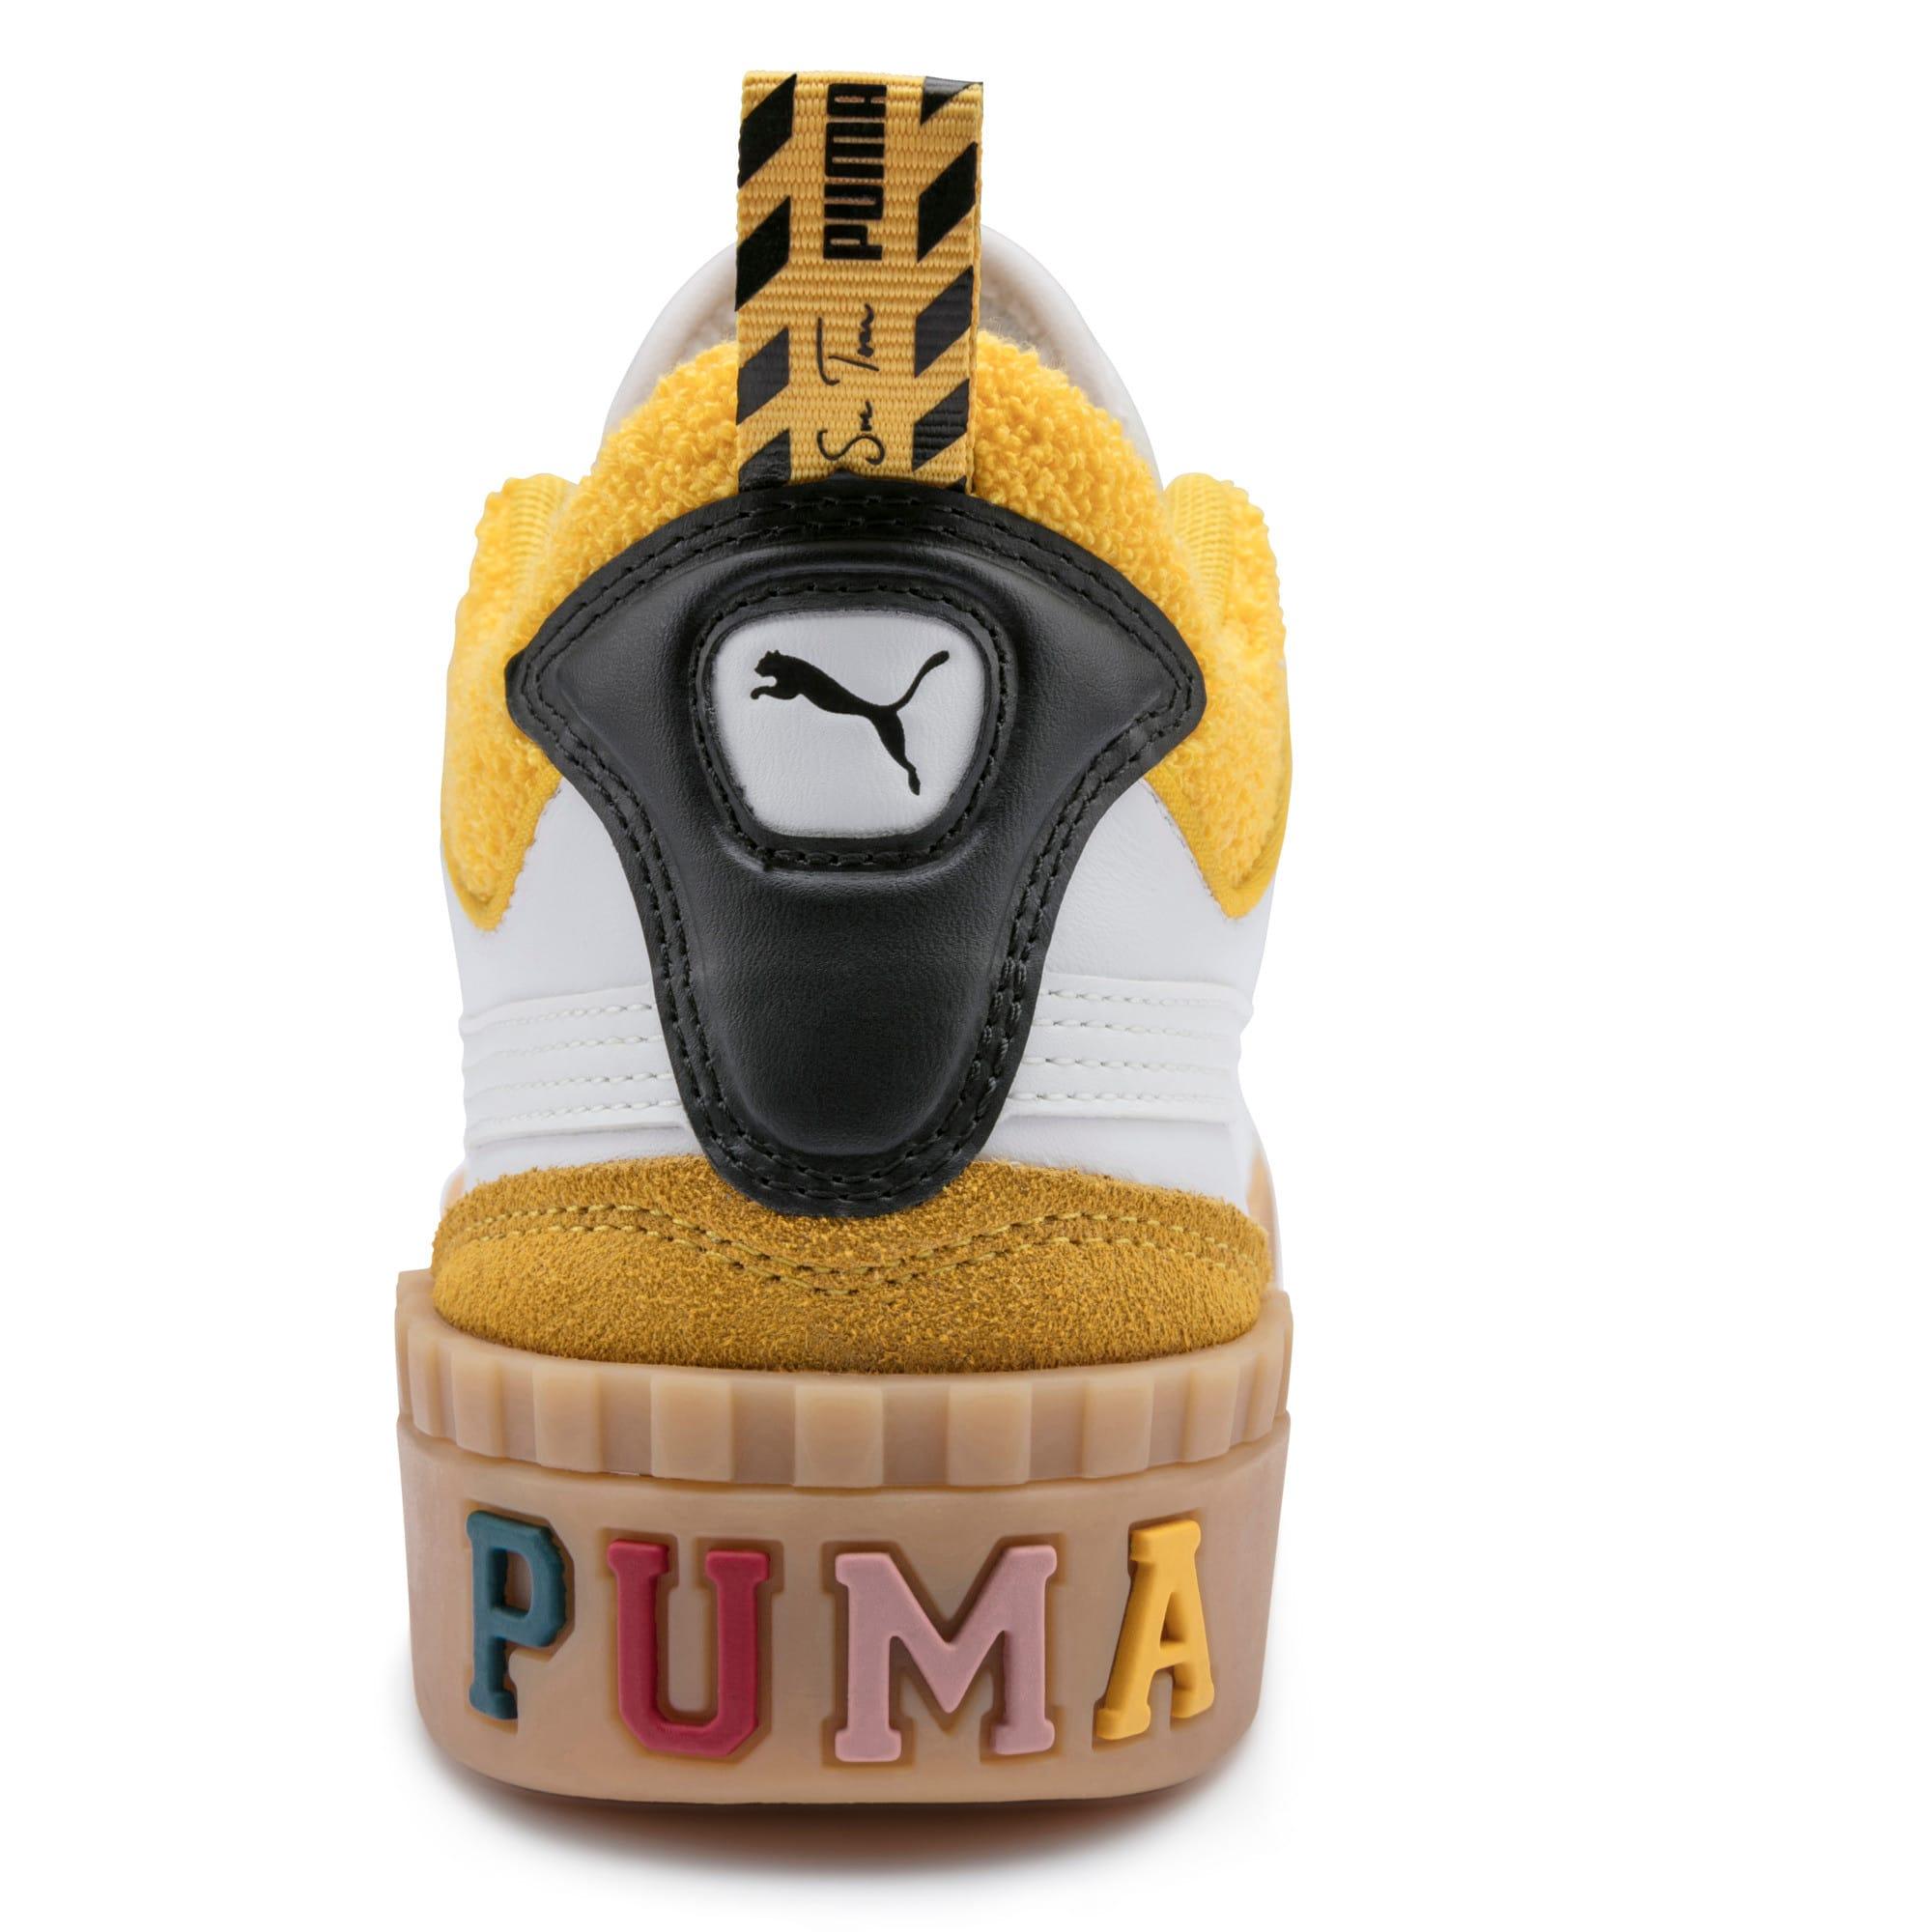 Thumbnail 8 of PUMA x SUE TSAI ウィメンズ CALI スニーカー, Bright White-Bright White, medium-JPN